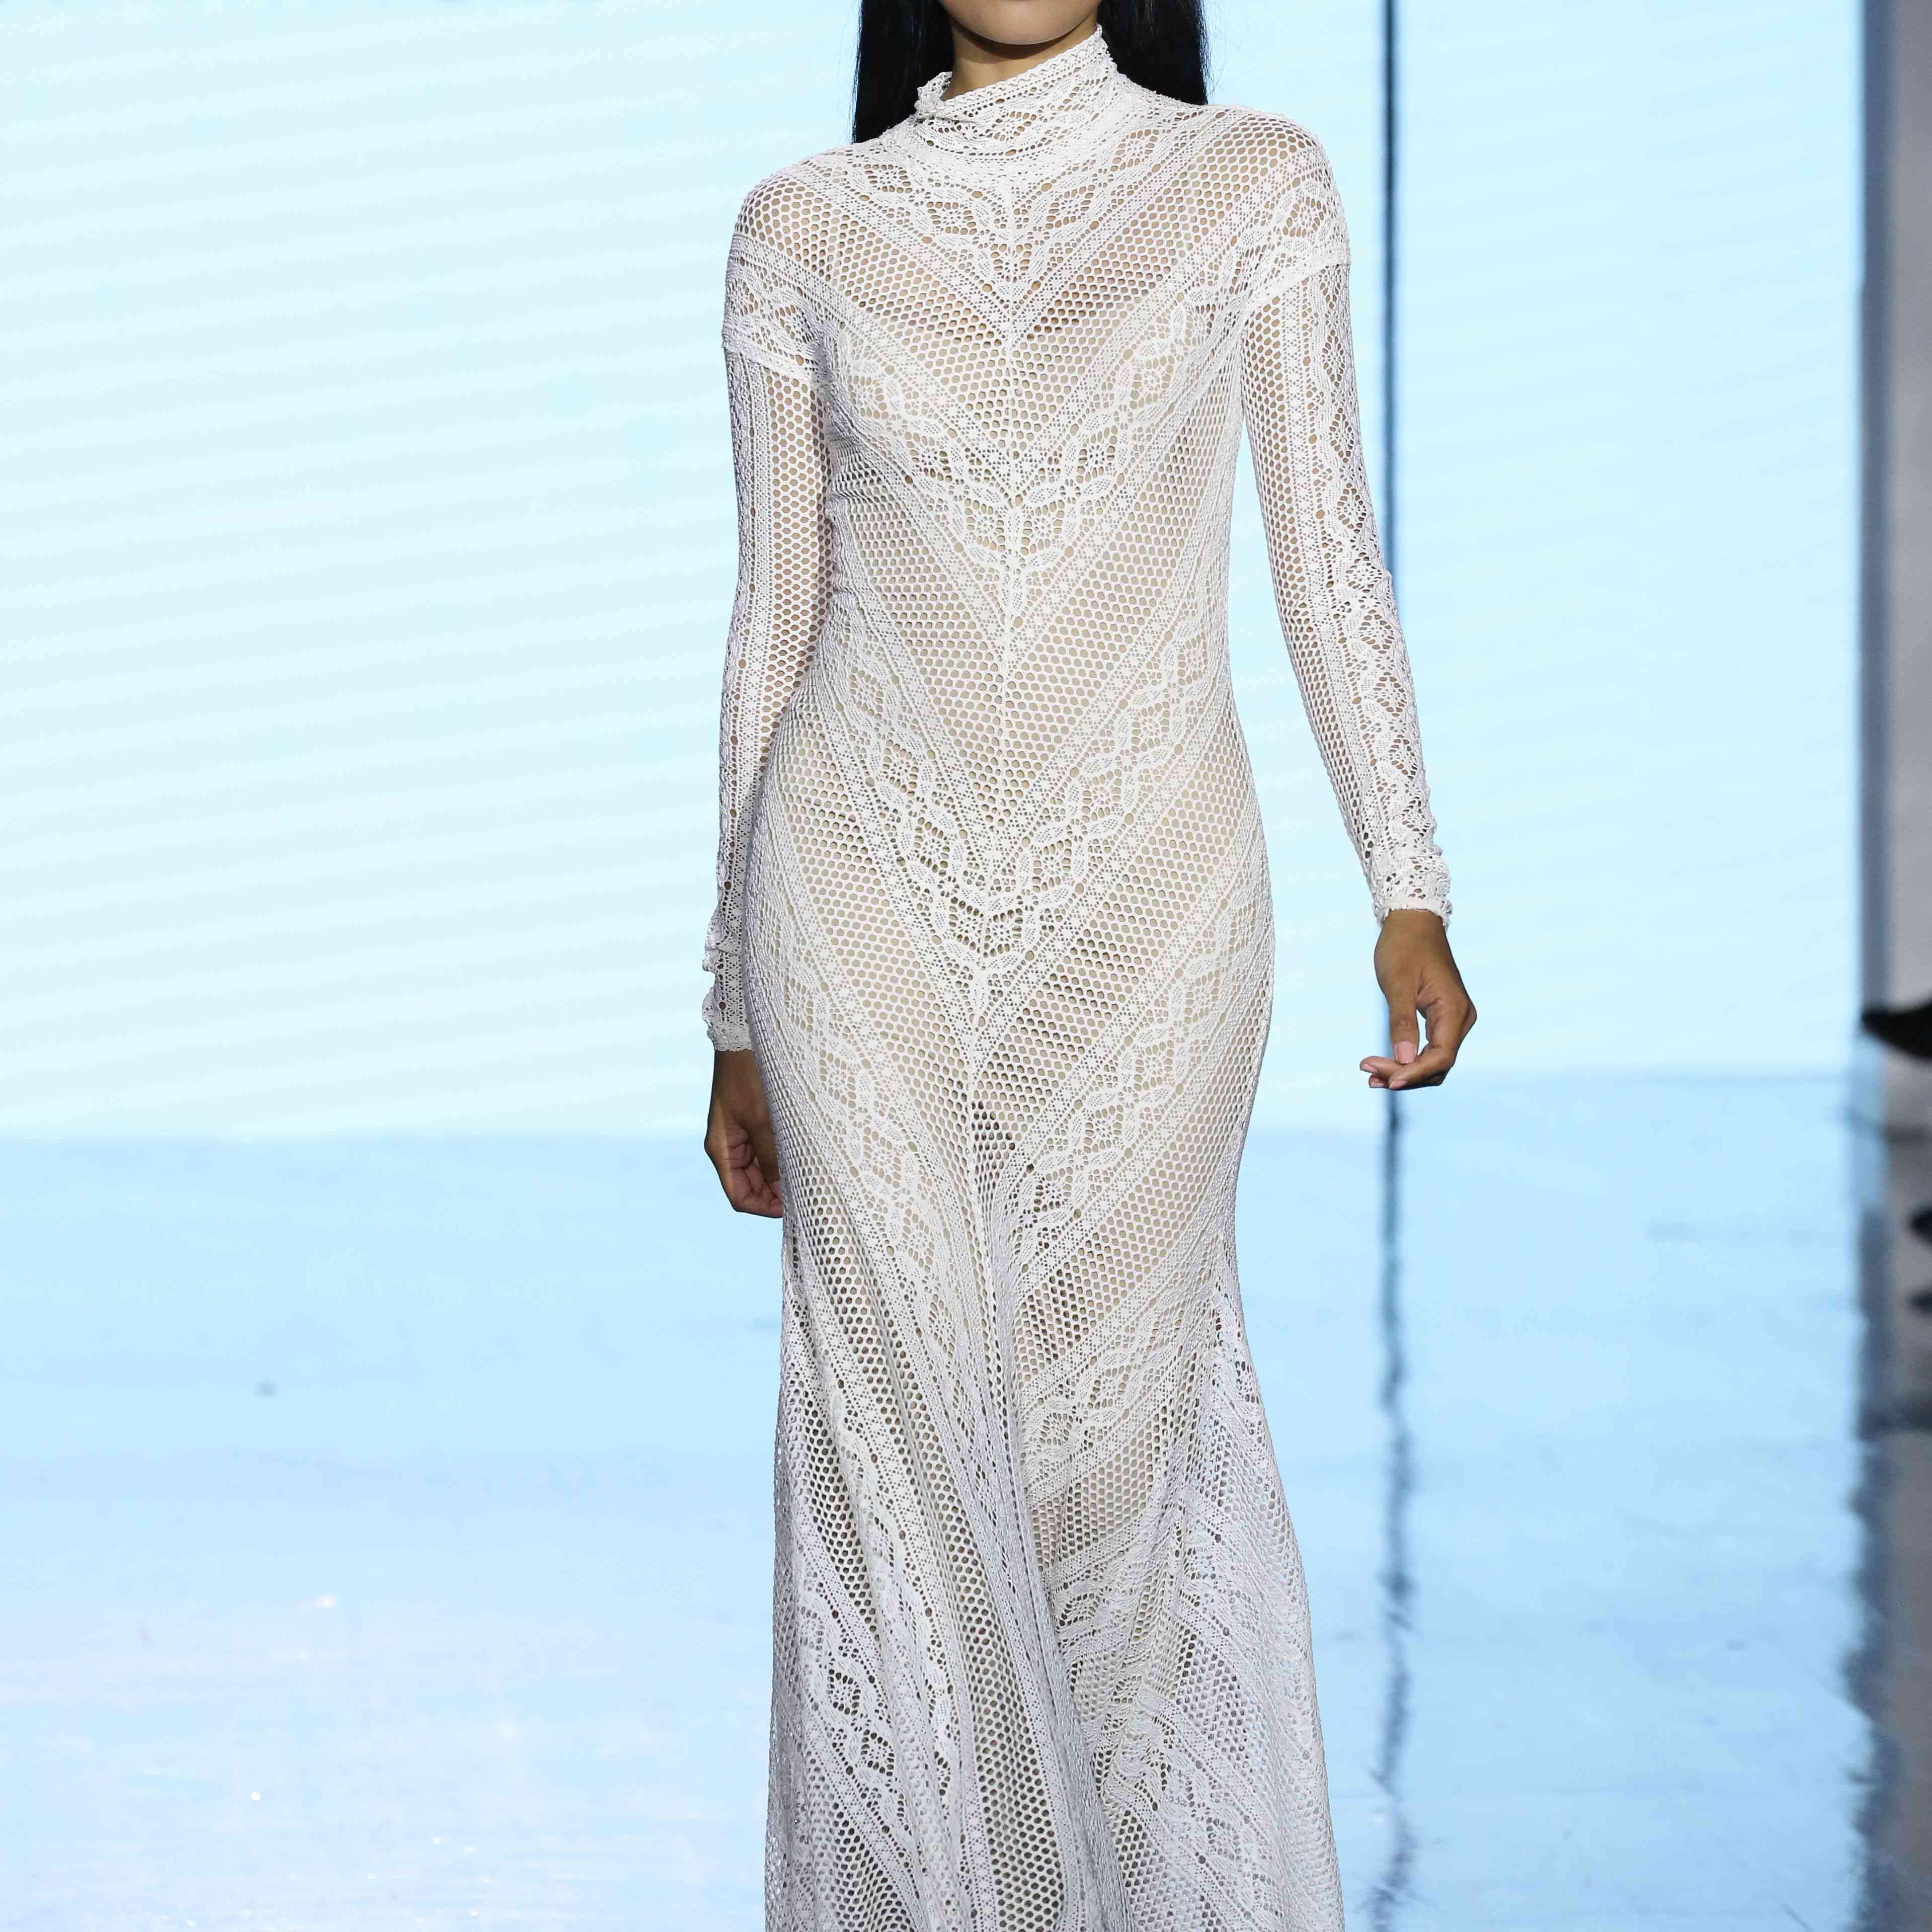 Model in long-sleeve high-neck sheer lace wedding dress